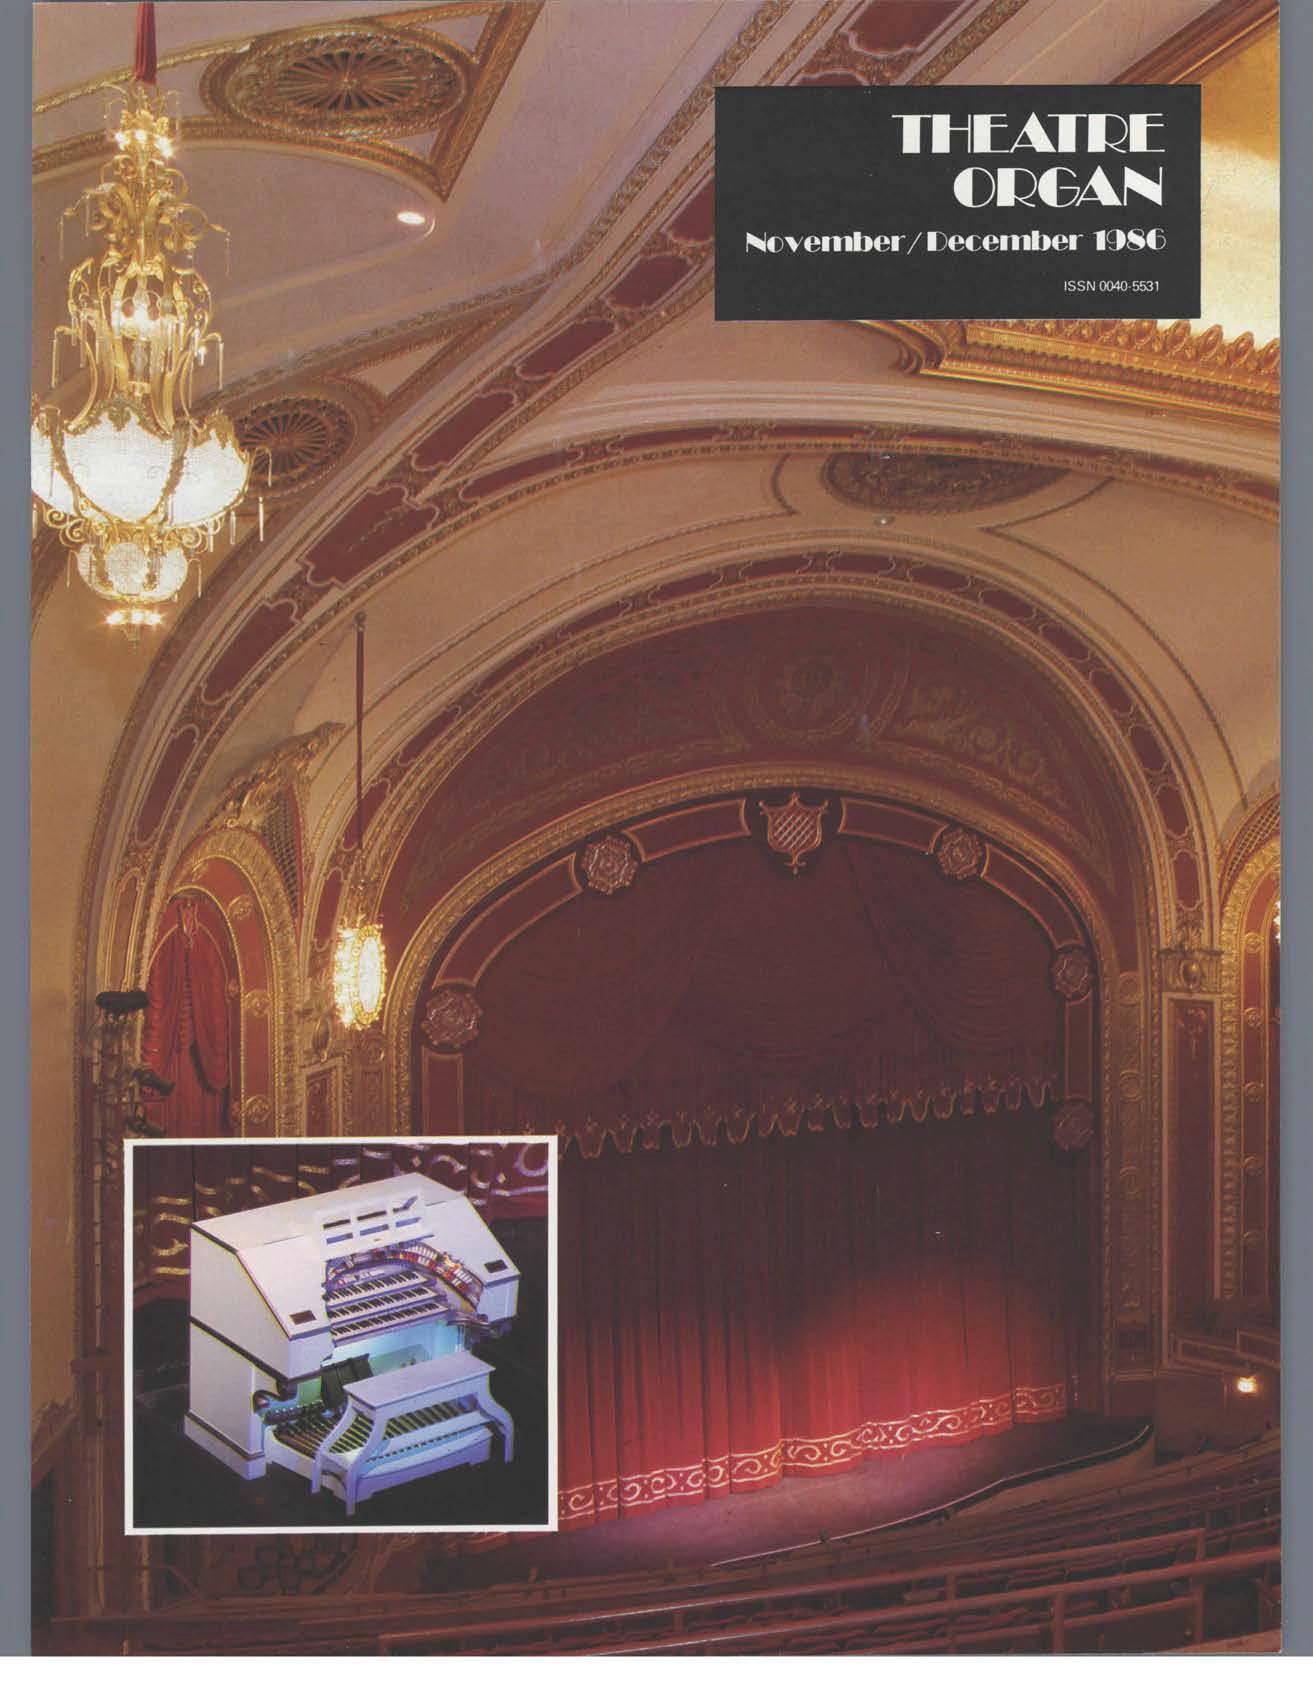 Theatre Organ, November - December 1986, Volume 28, Number 6